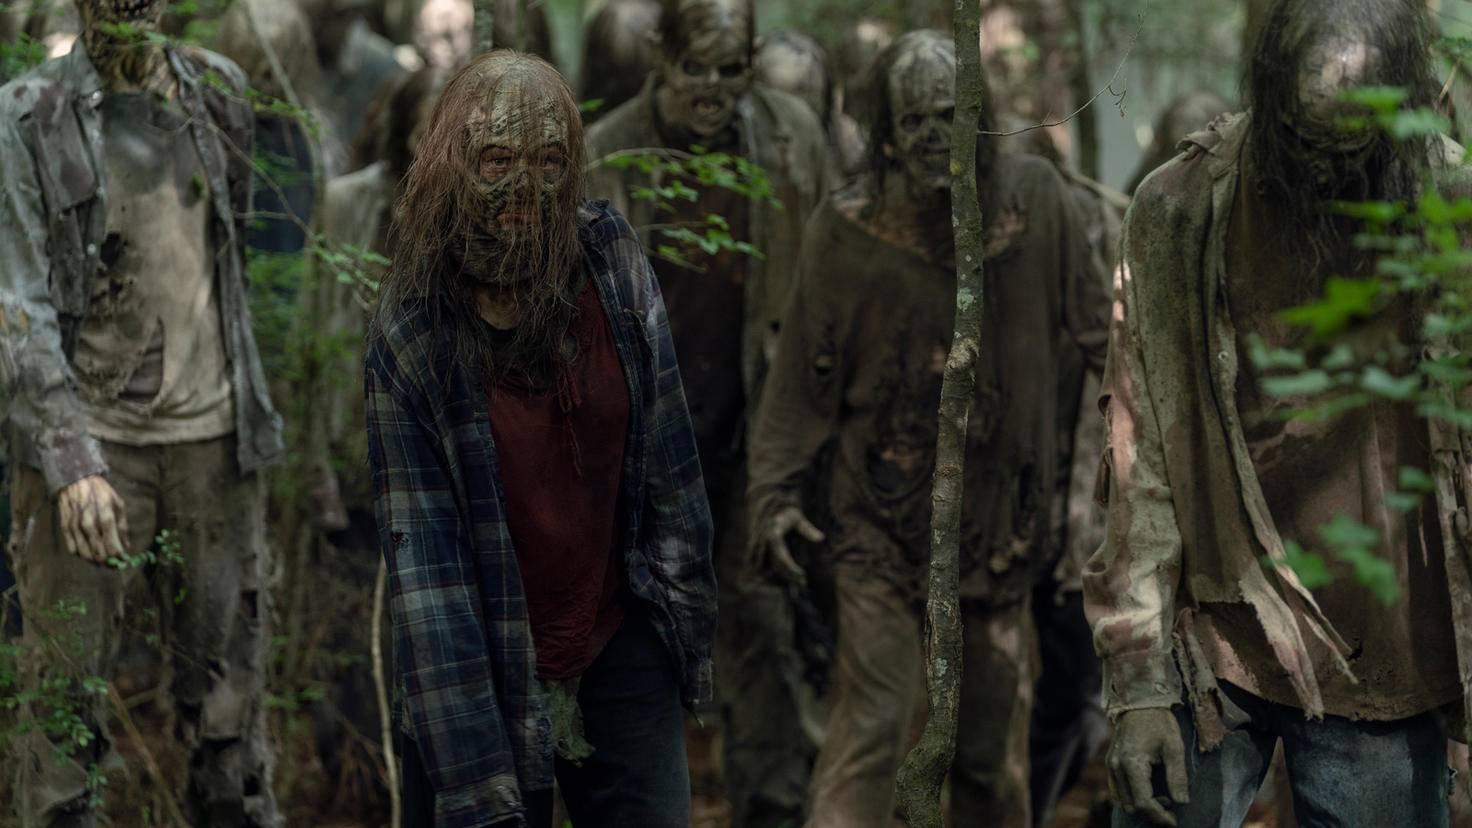 The Walking Dead-S10E02-Gamma-Jace Downs-AMC